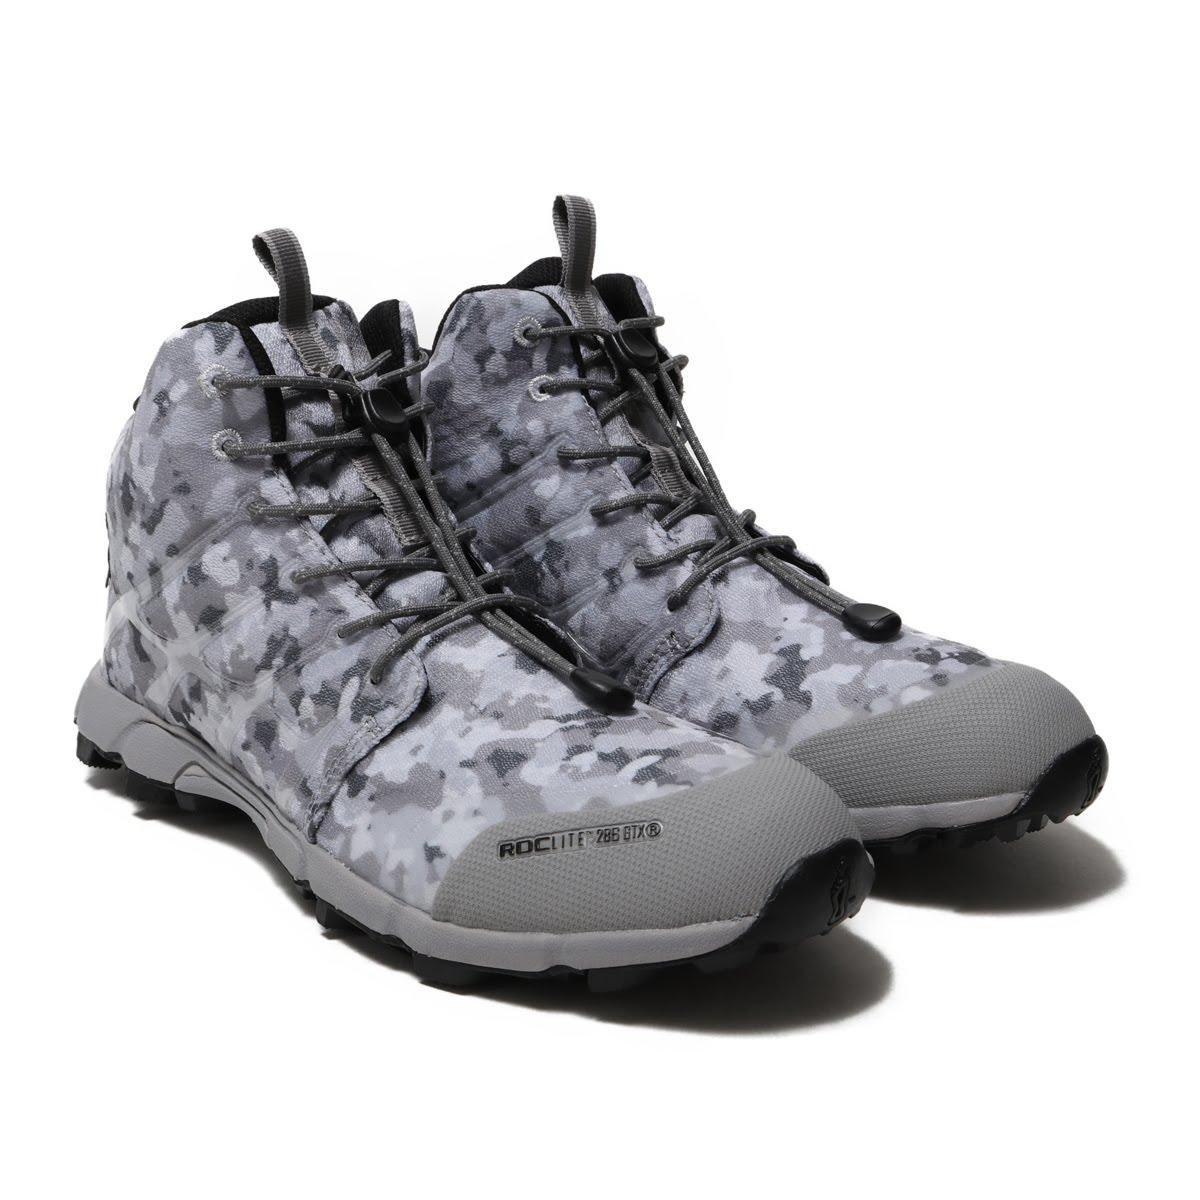 foot the coacher URBANCAMO286 (フットザコーチャー アーバンカモ286)URBANCAMO【メンズ スニーカー】18FW-I